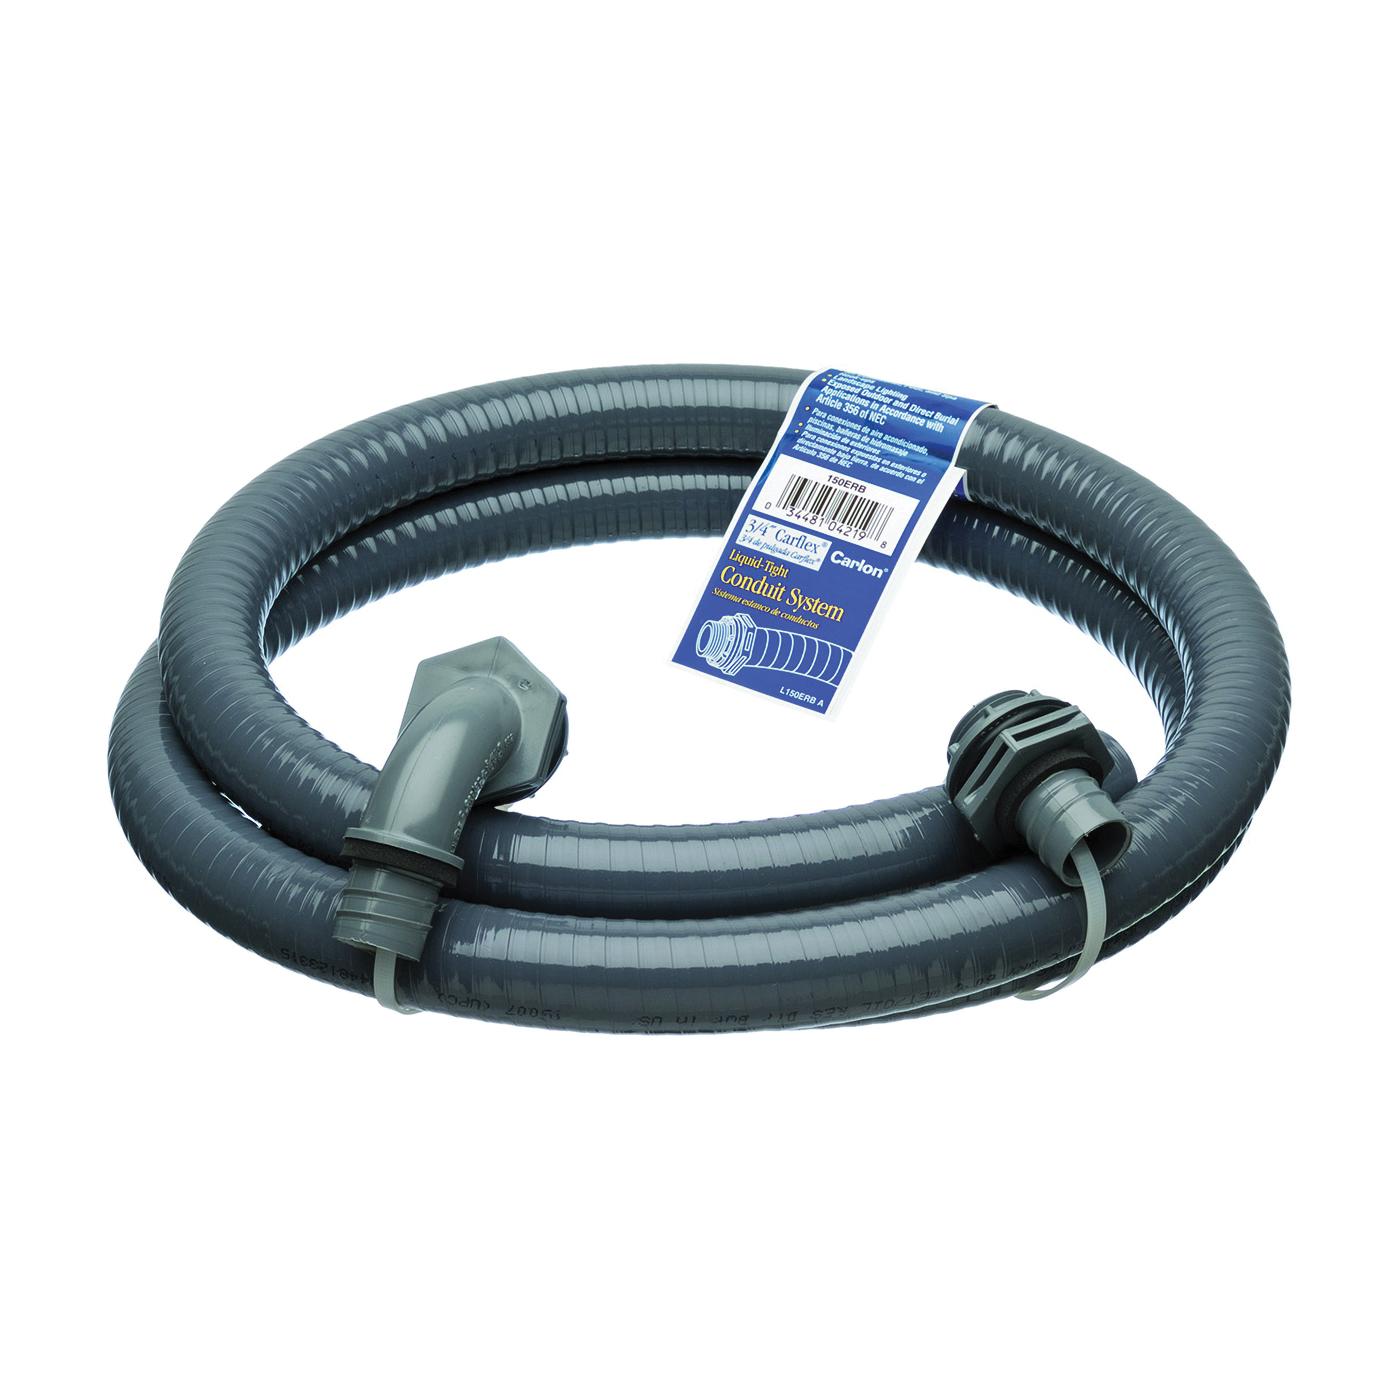 Picture of Carlon 150ERB Electrical Conduit, 6 ft L, 3/4 in Trade, PVC